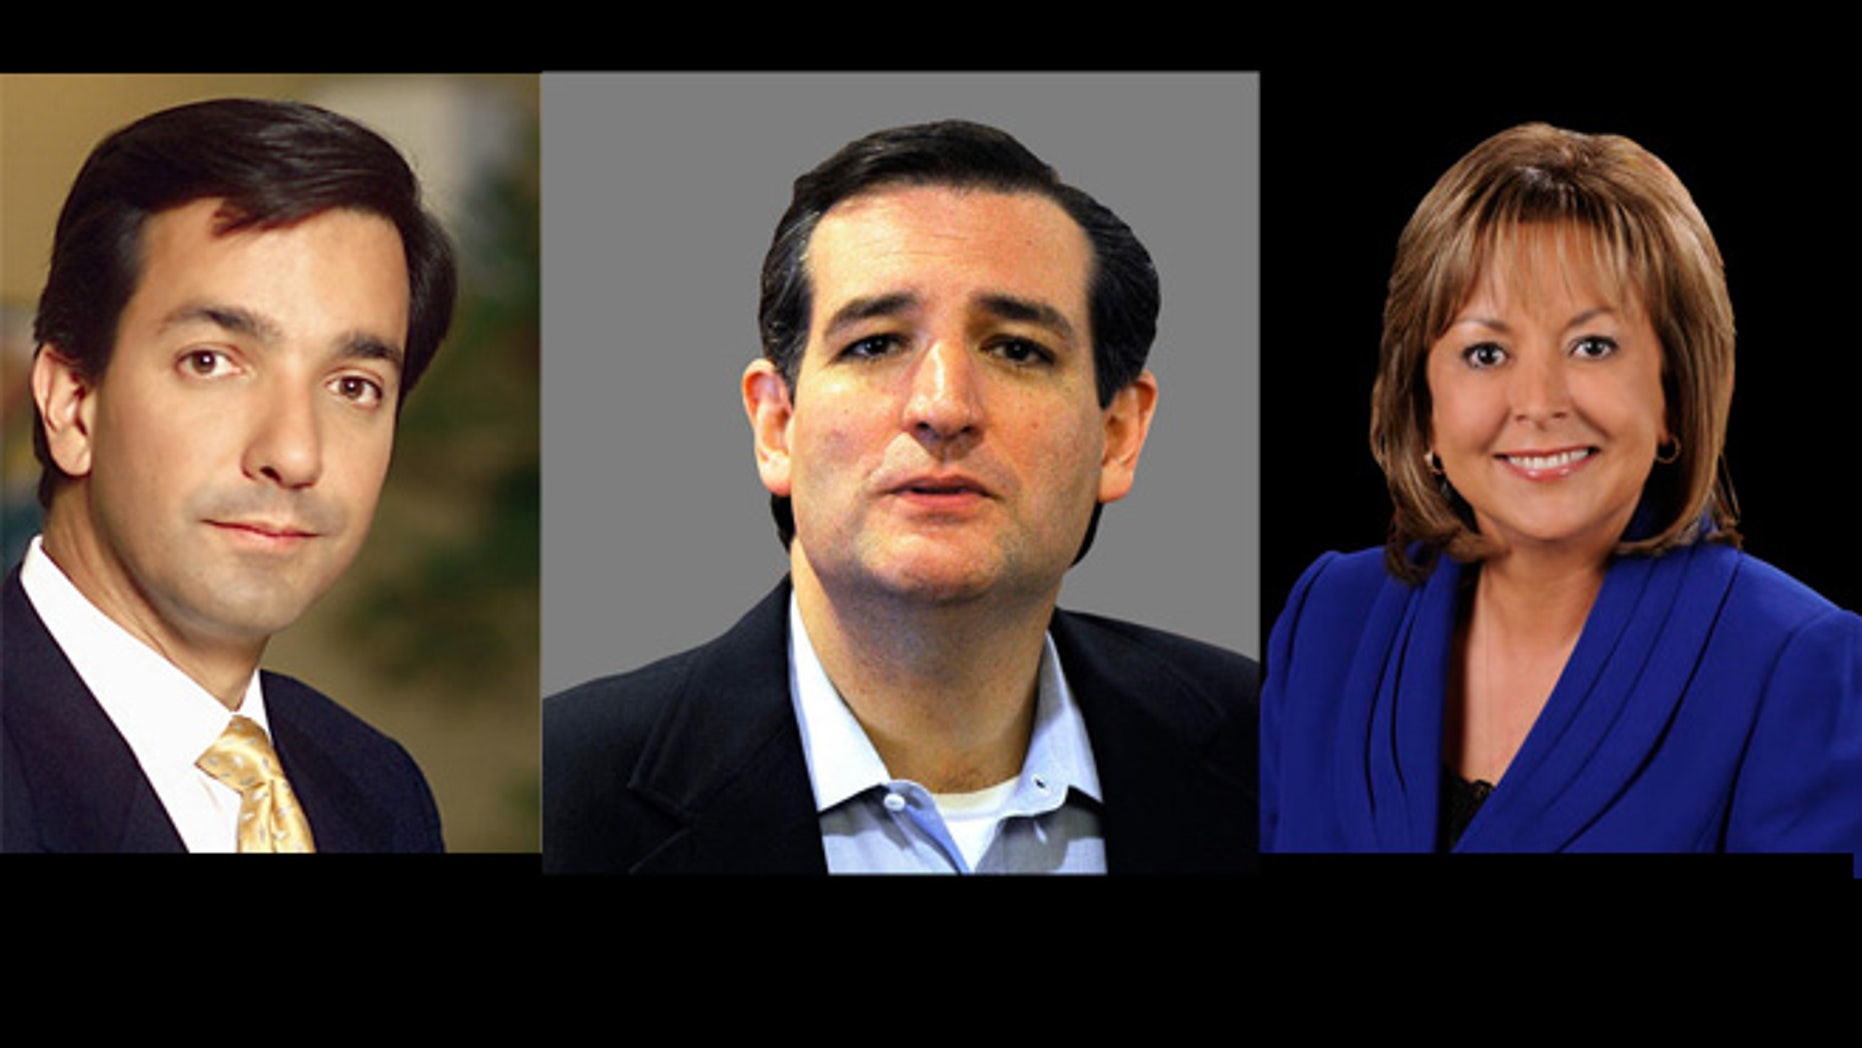 From left to right: Republicans Puerto Rico Gov. Luis Fortuño, U.S. Senate nominee Ted Cruz, and New Mexico Gov. Susana Martinez.